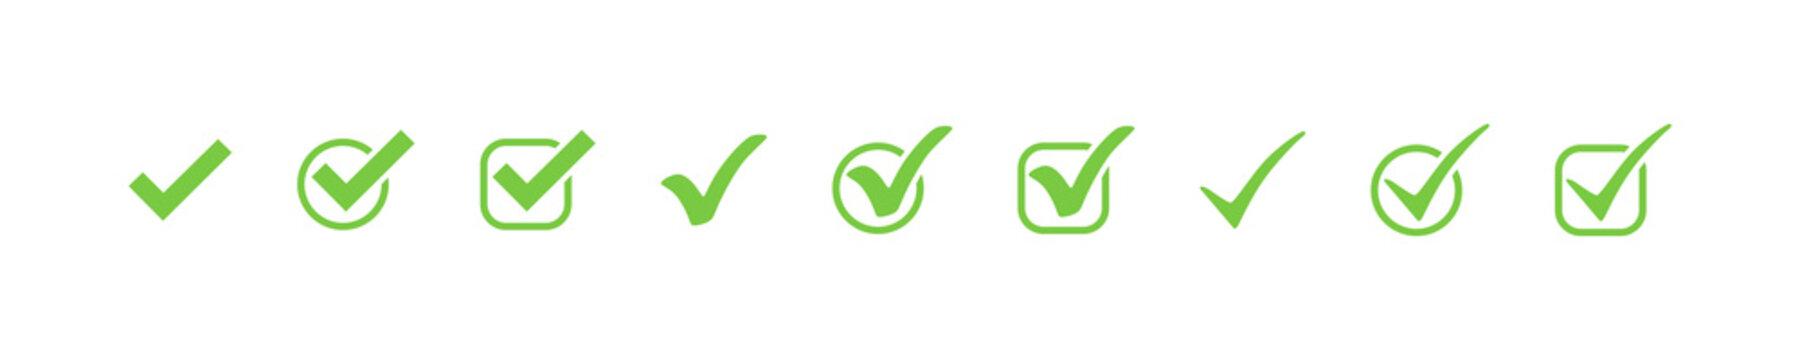 Check marks. Check mark green vector icons, isolated. Simple check marks. Checklist symbols. Vector illustration